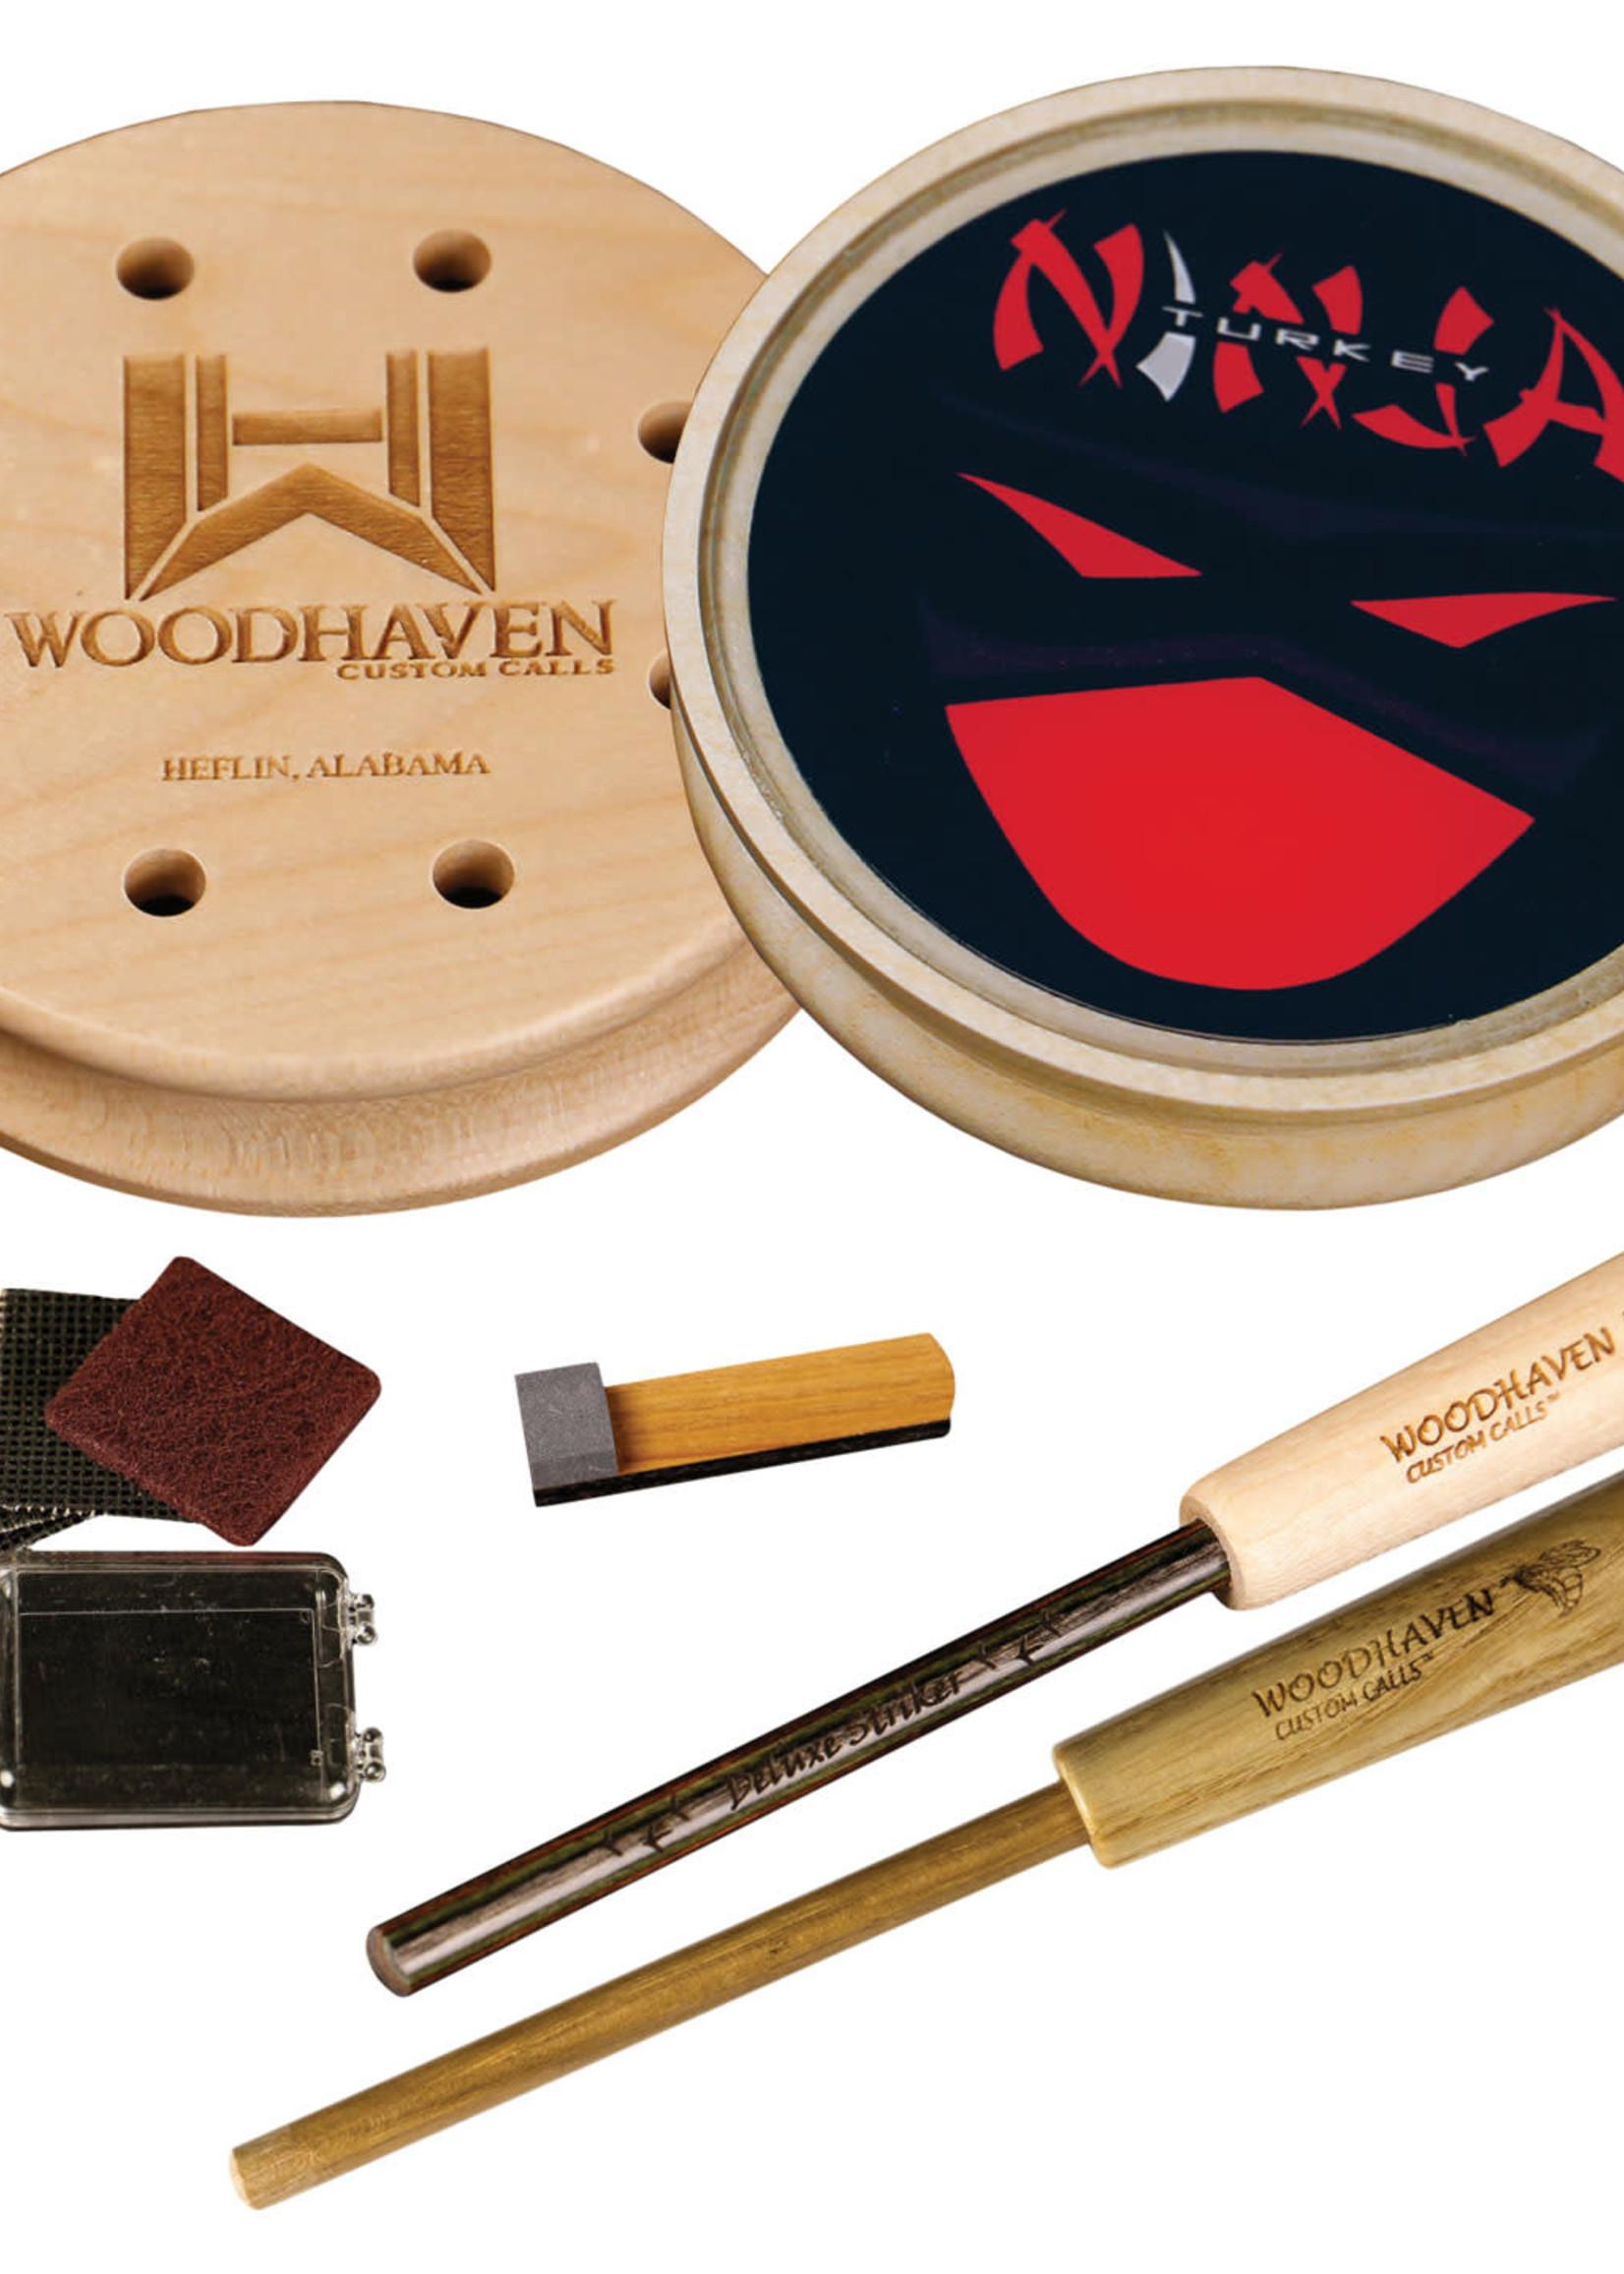 Woodhaven Custom Calls Woodhaven Red Ninja Pot Call